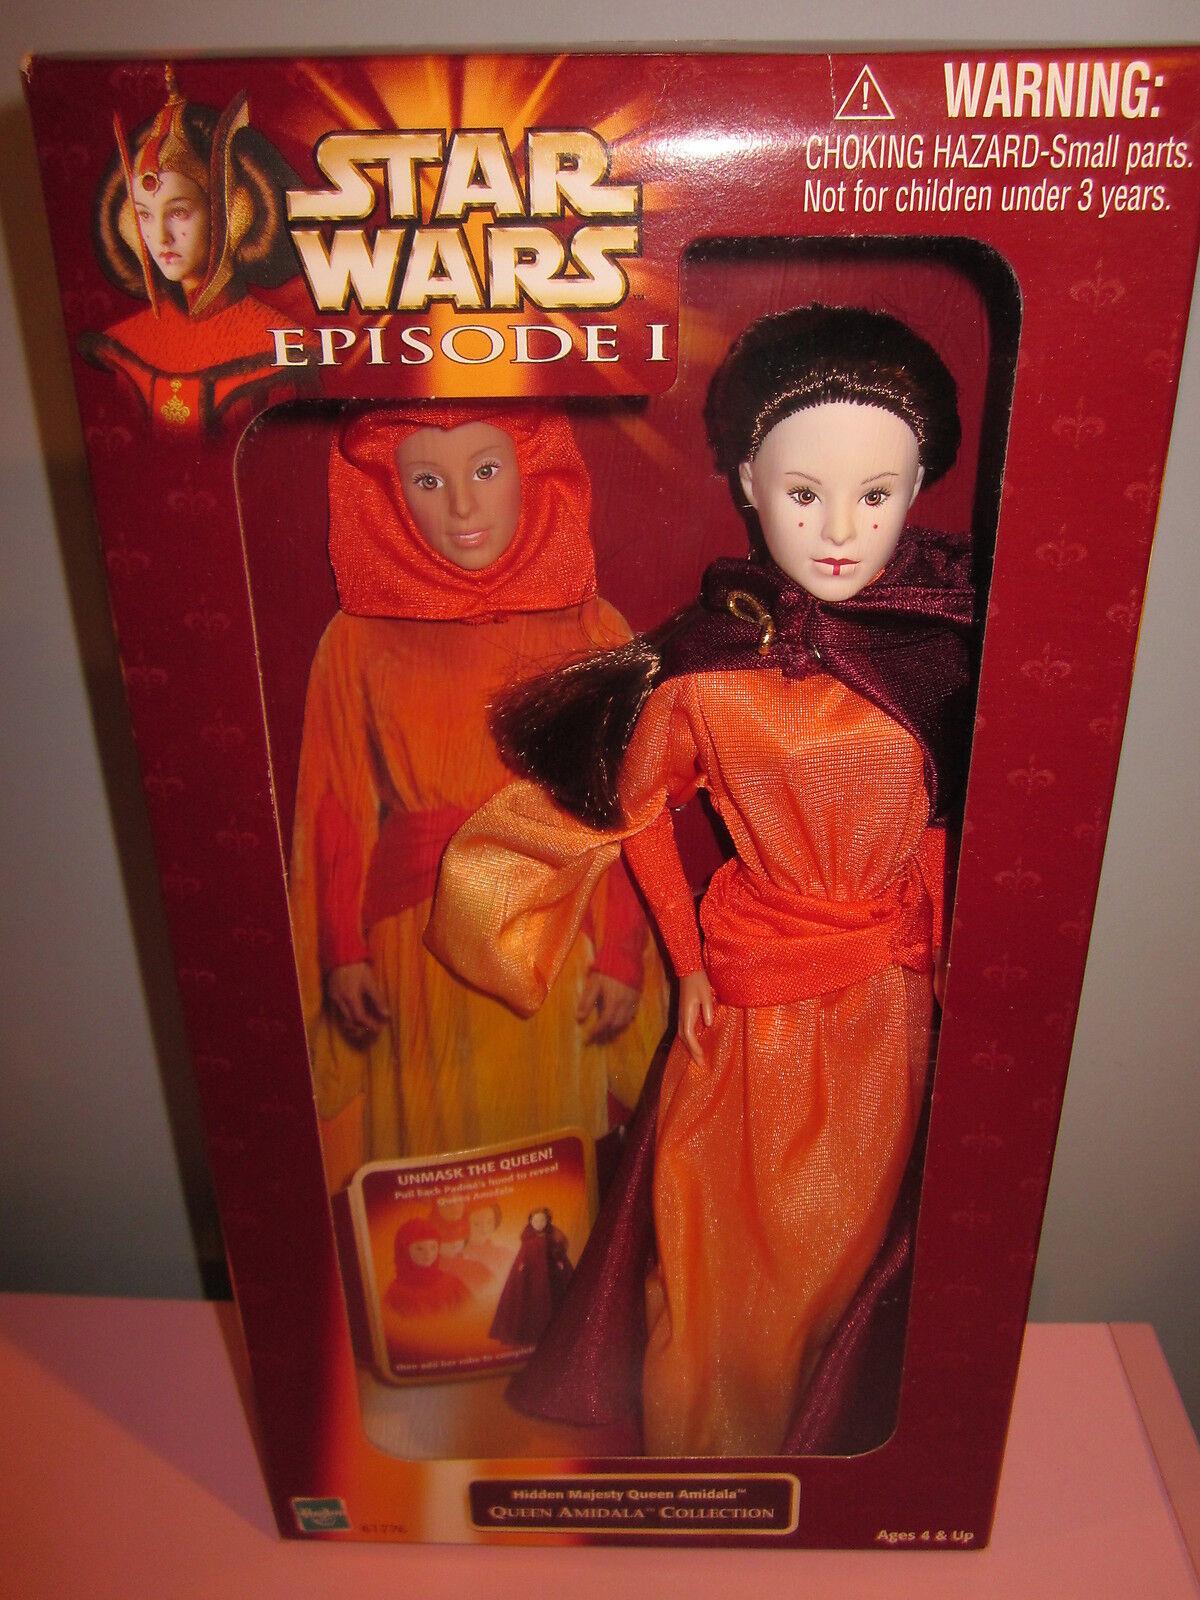 Hasbro Star Wars Episodi 1 30.5cm Nascosto Majesty Regina Amidala Sigillato